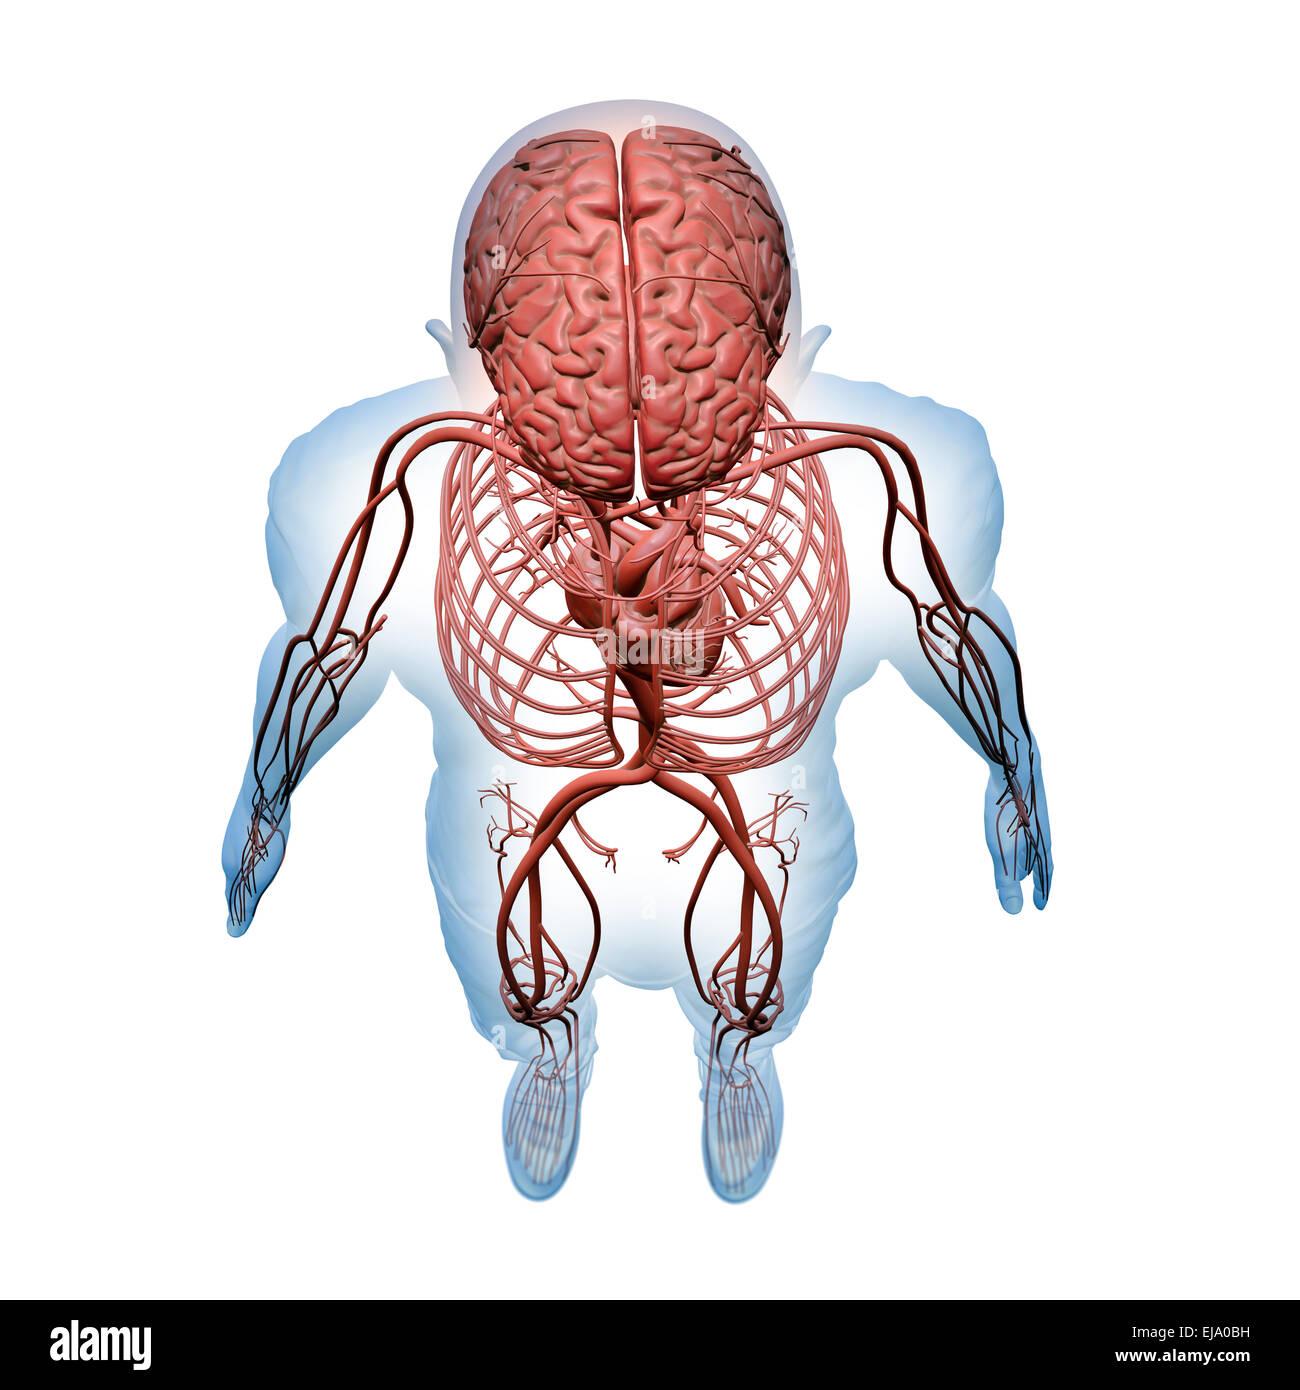 Human Organ Systems Stockfotos Human Organ Systems Bilder Alamy